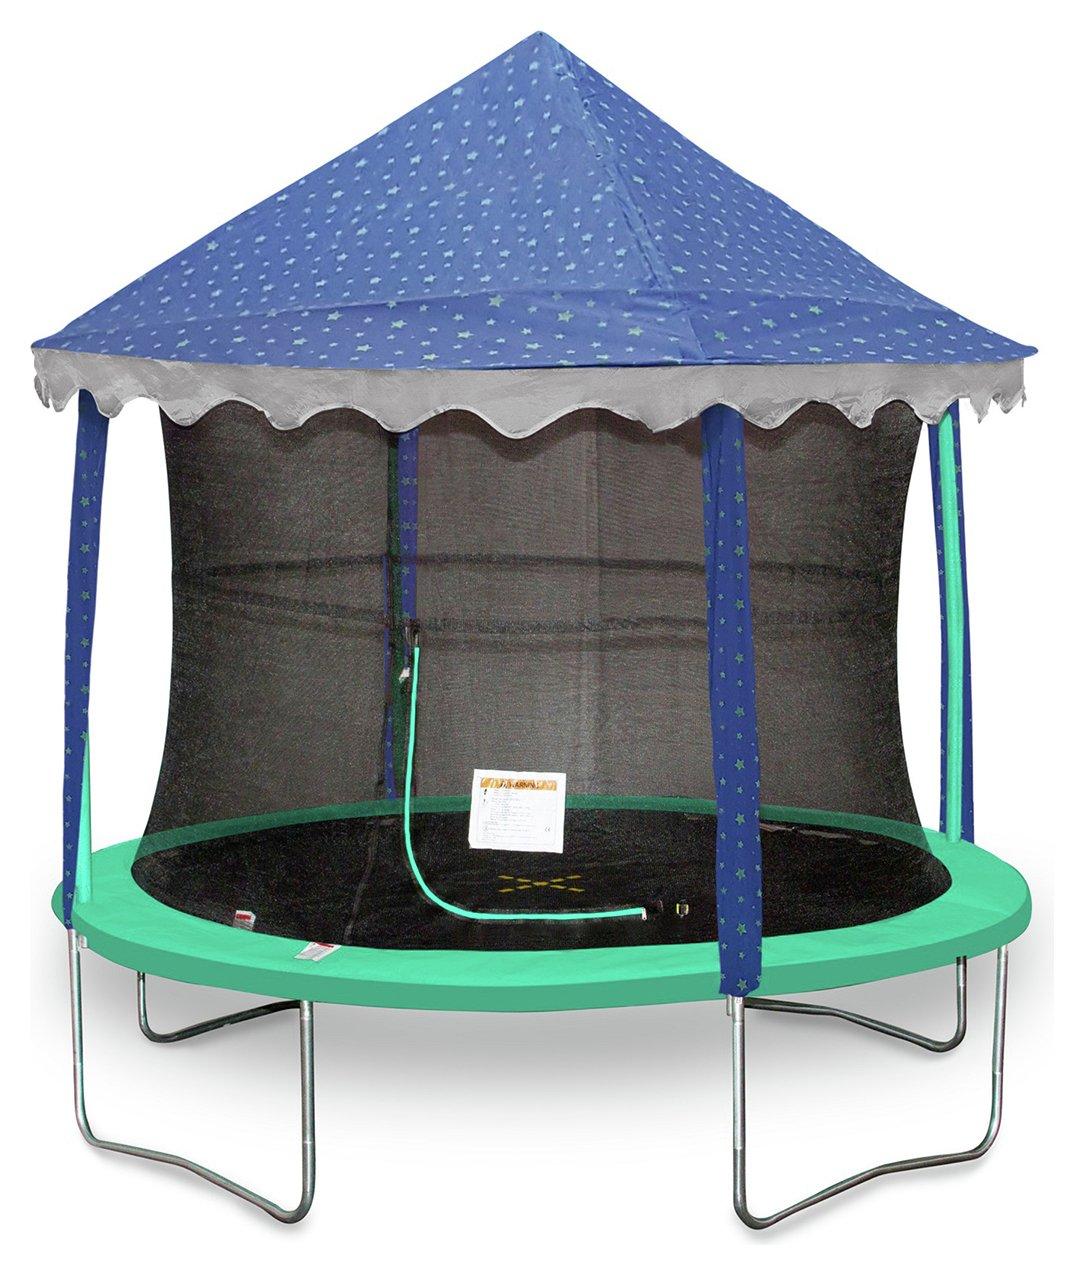 Jumpking 14ft Star Tent Canopy